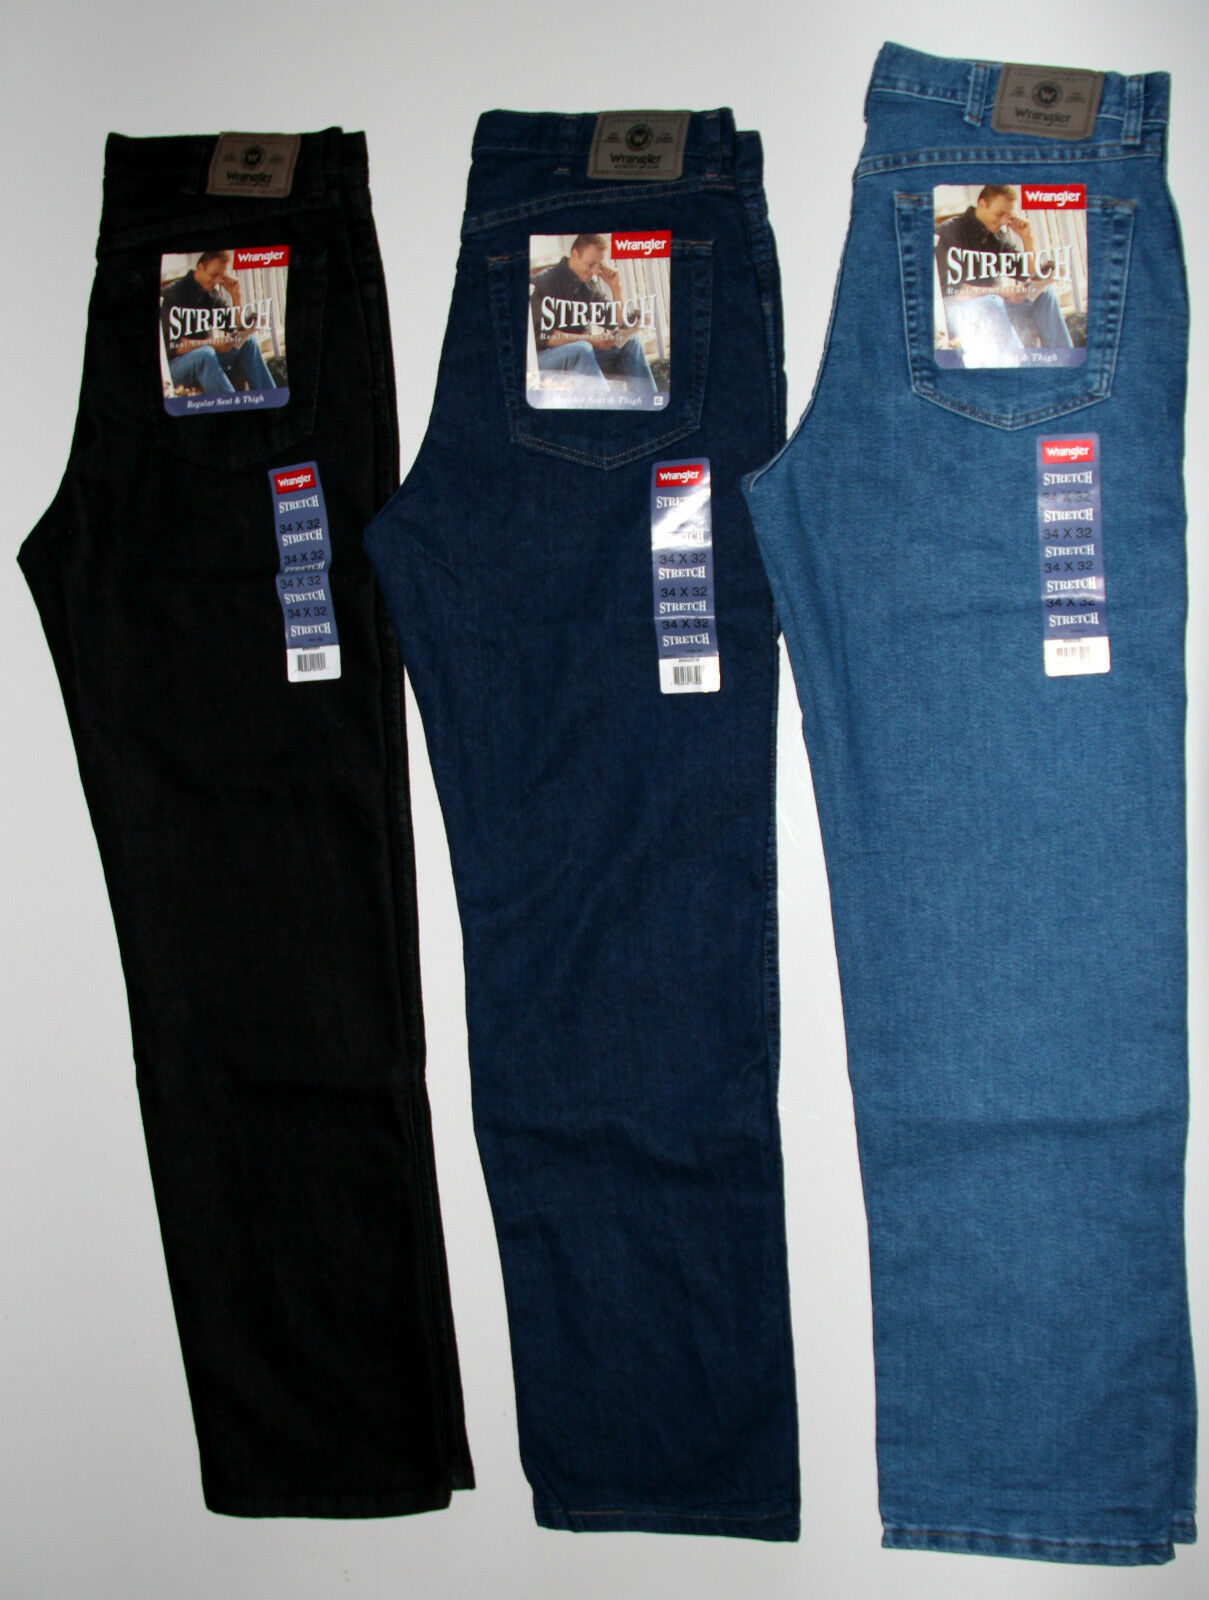 W12109004 Herren Stretch Jeans Black Overdye Wash Wrangler Regular Fit